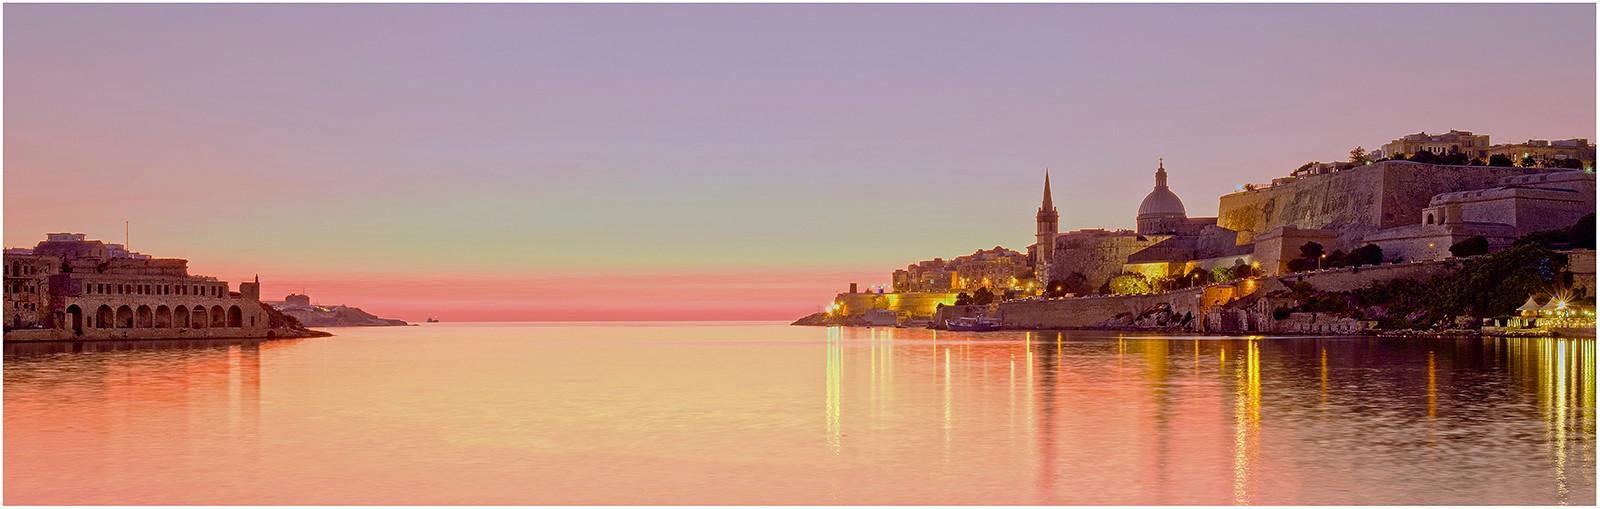 PDI - Malta Vista by Jim McConville (10 marks)